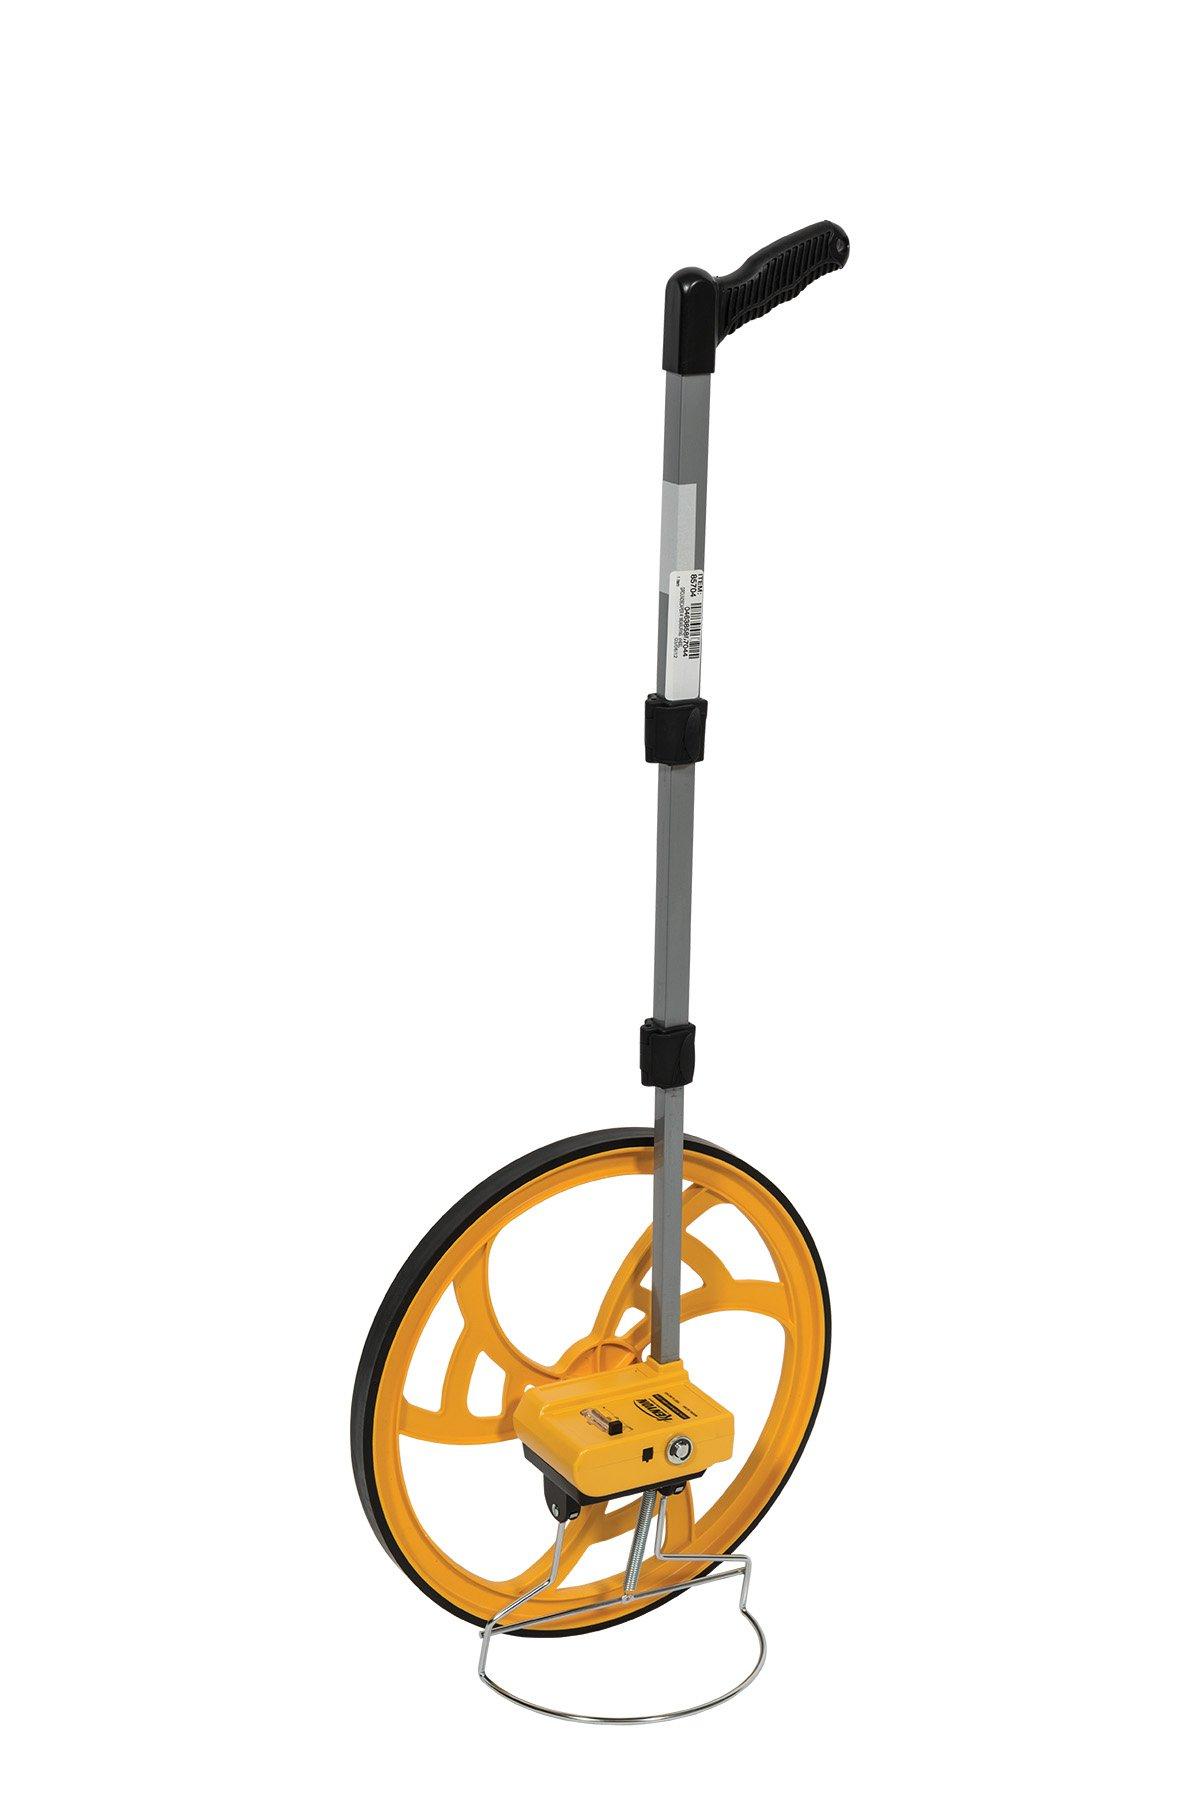 Kenyon 85704   GroundScaper 4' Measuring Wheel